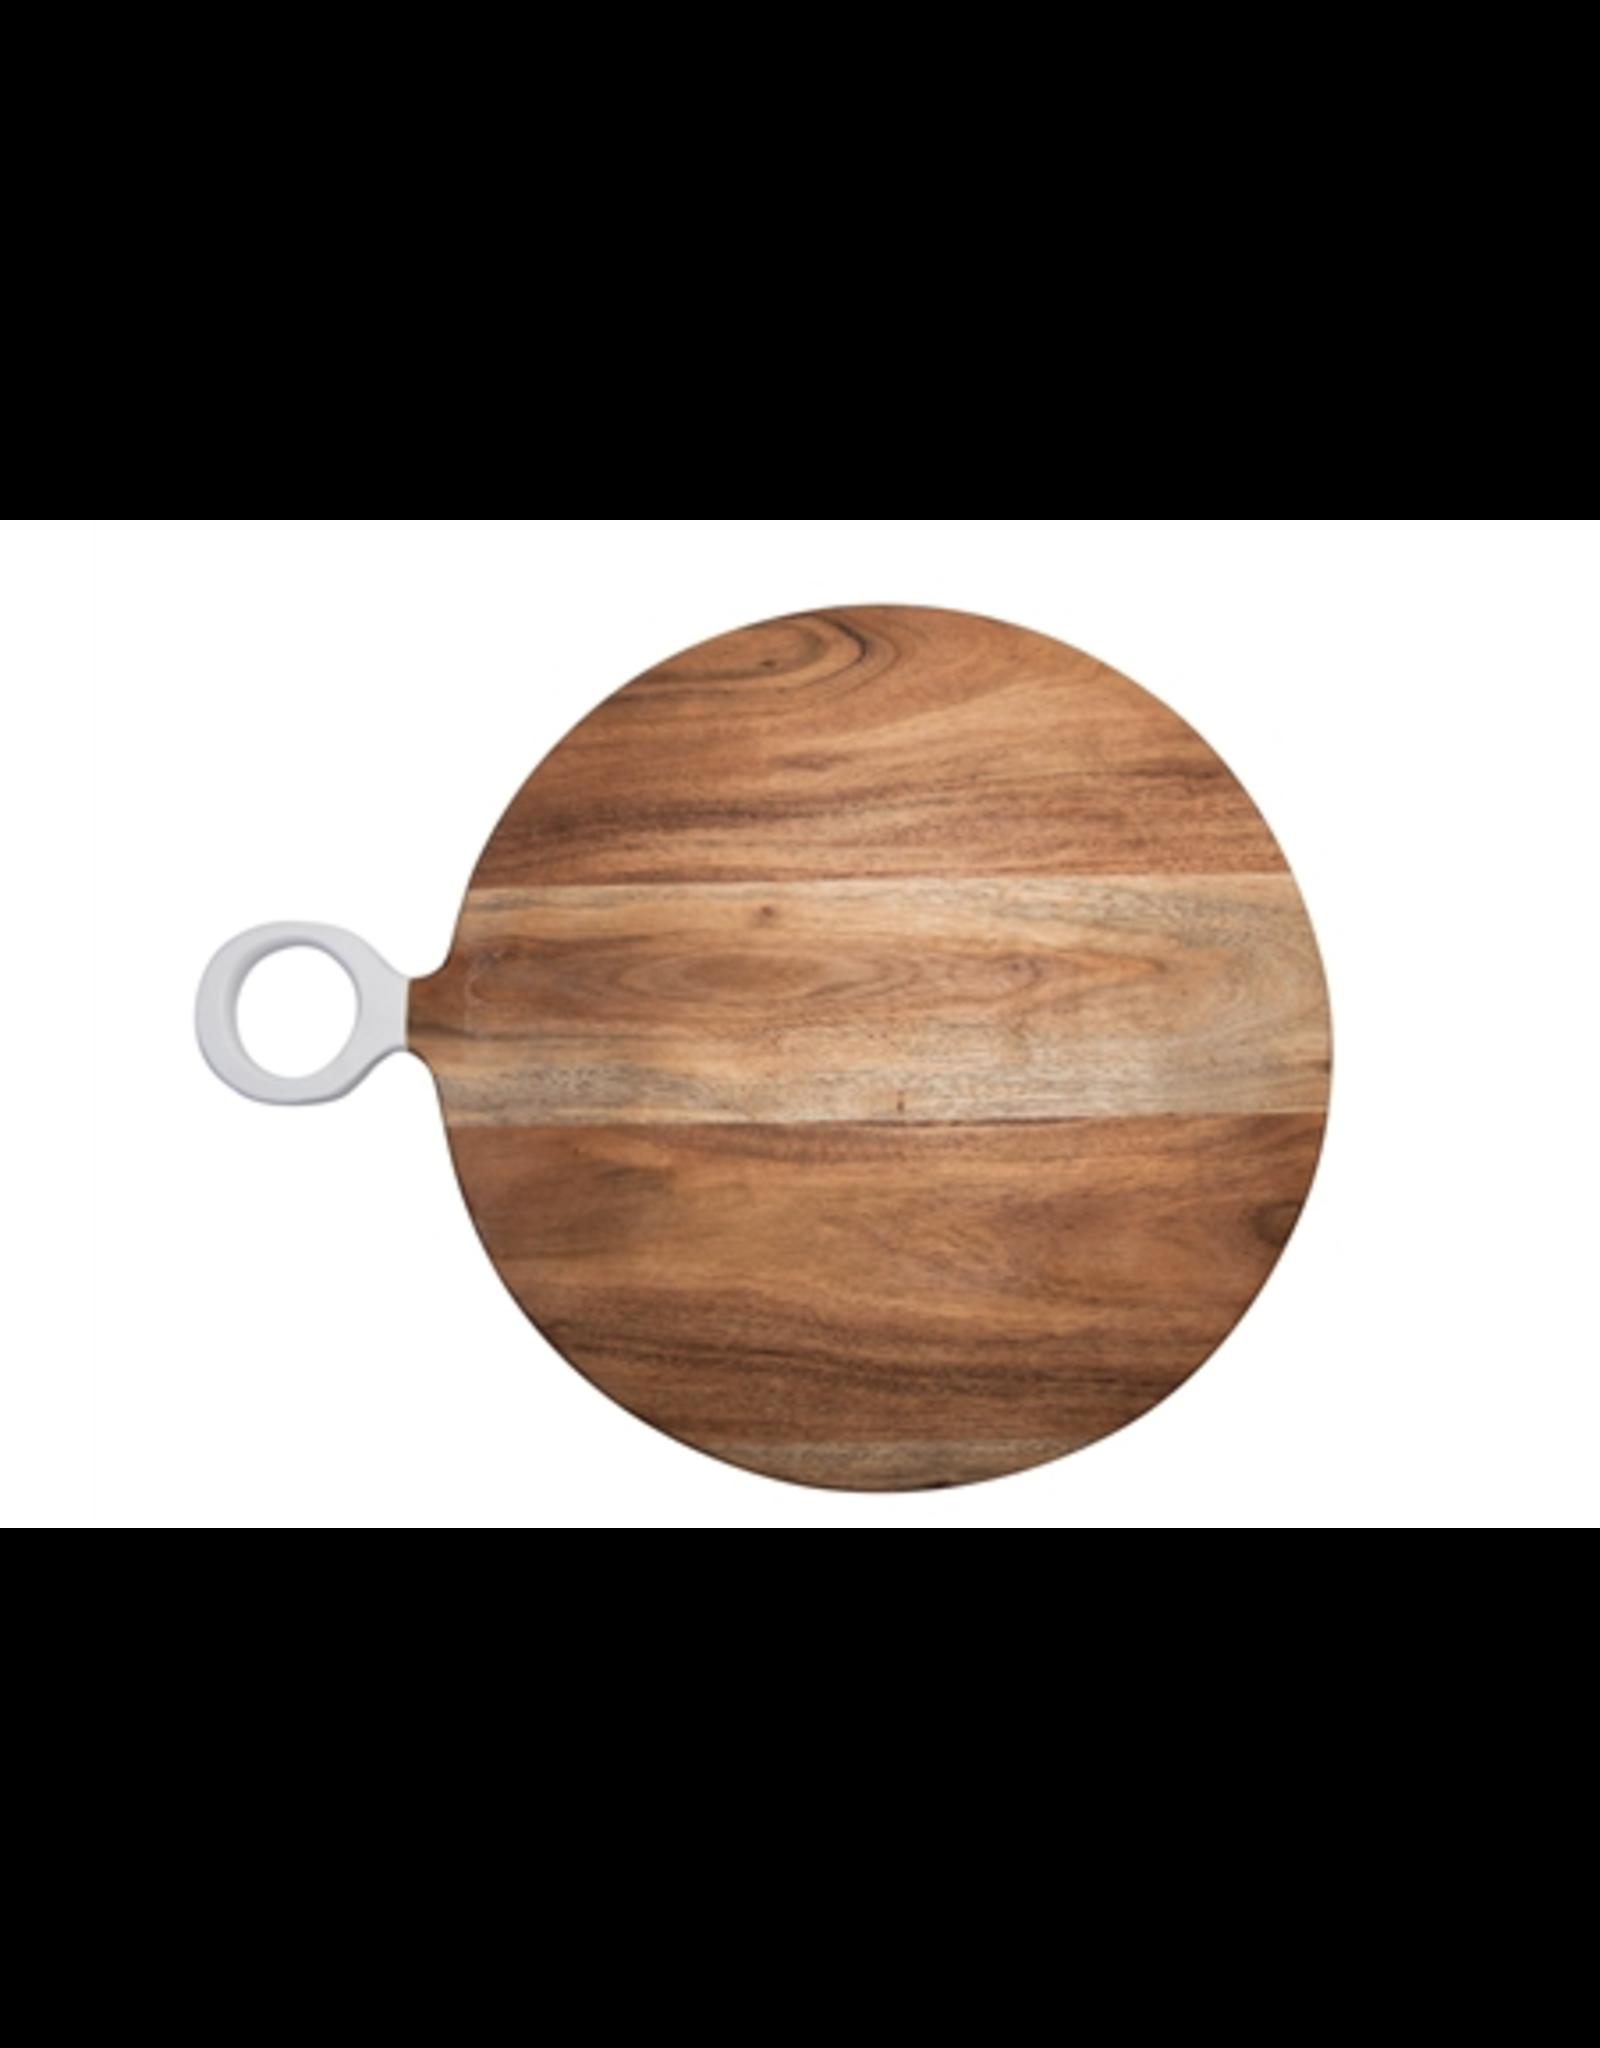 "BIDK Acacia Wood Round Cutting Board with White Handle 13.75"""